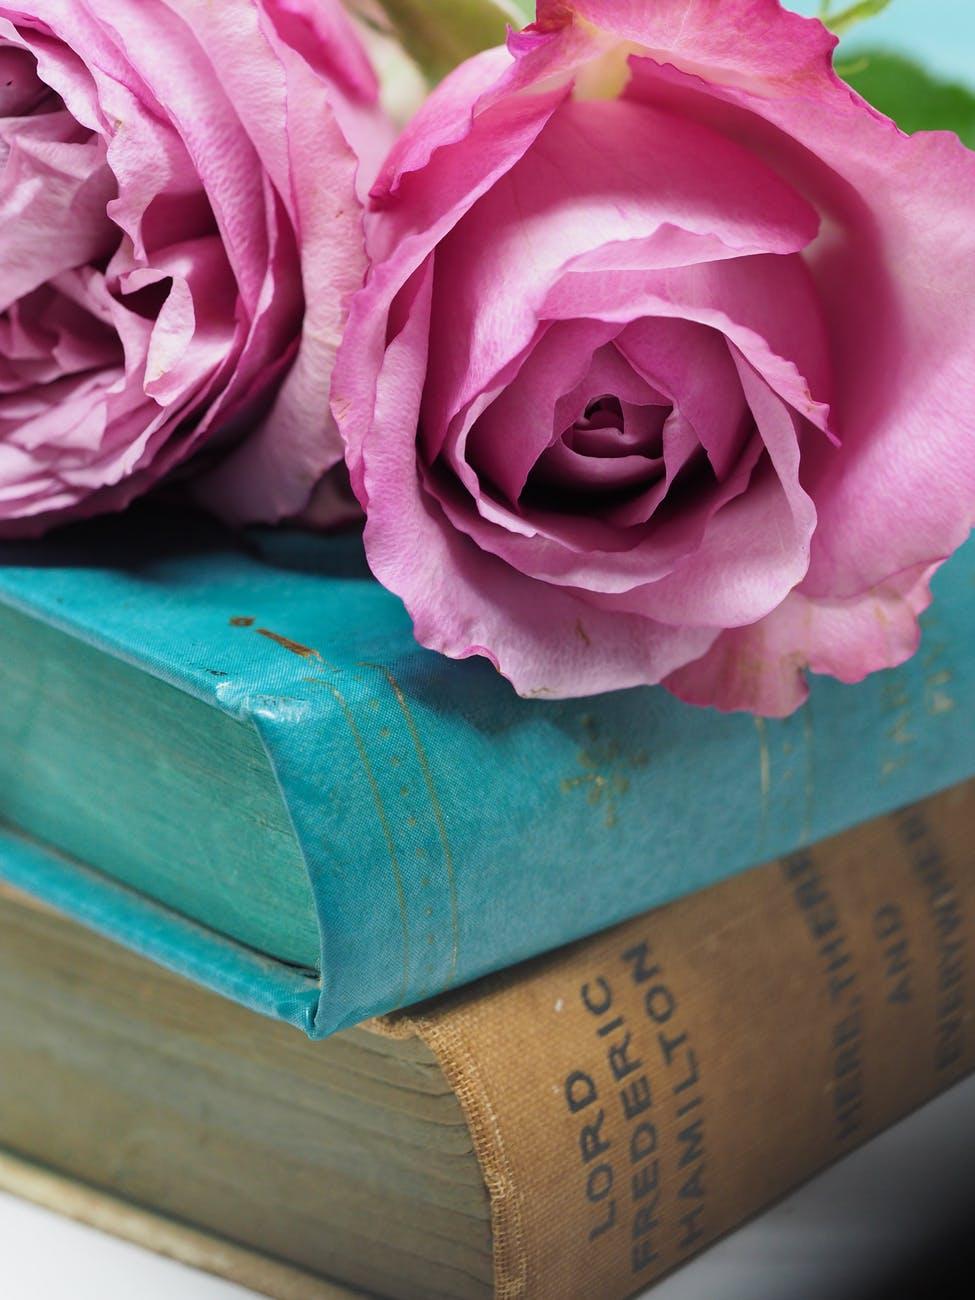 pink rose flower on blue hardbound books